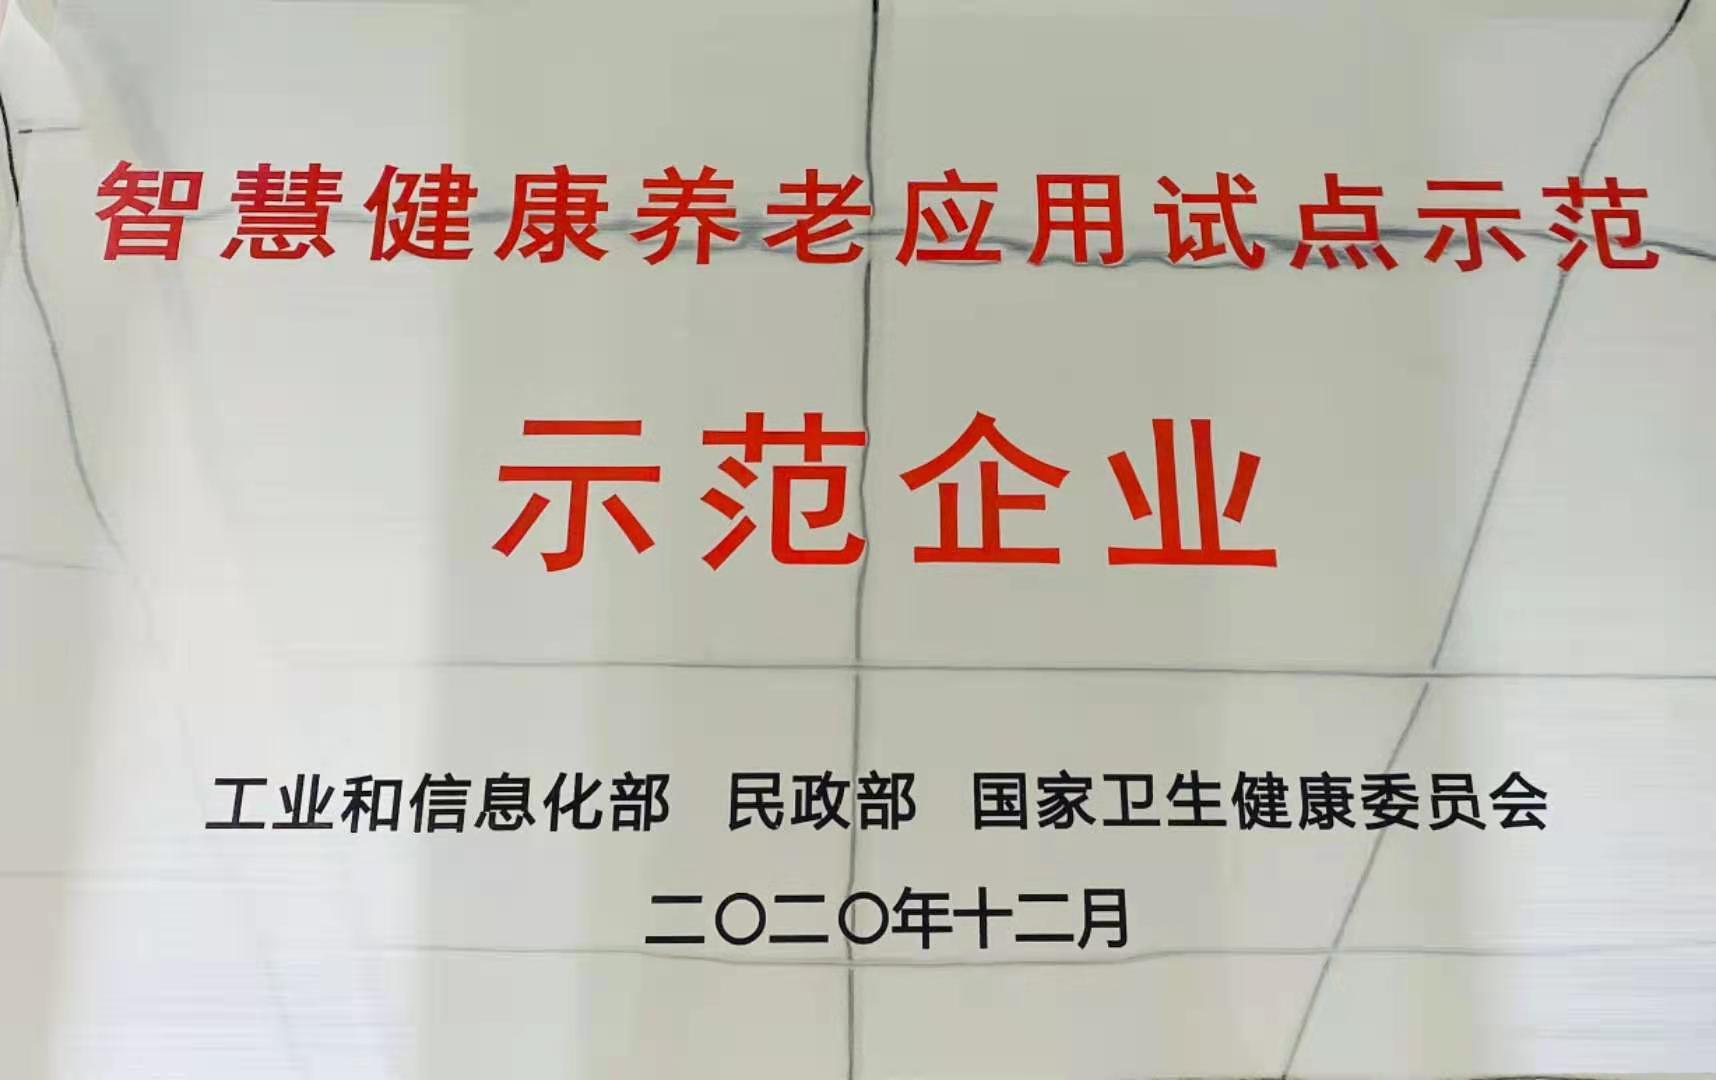 "www.194.net荣获""全国第四批智慧健康养老示范企业""称号"